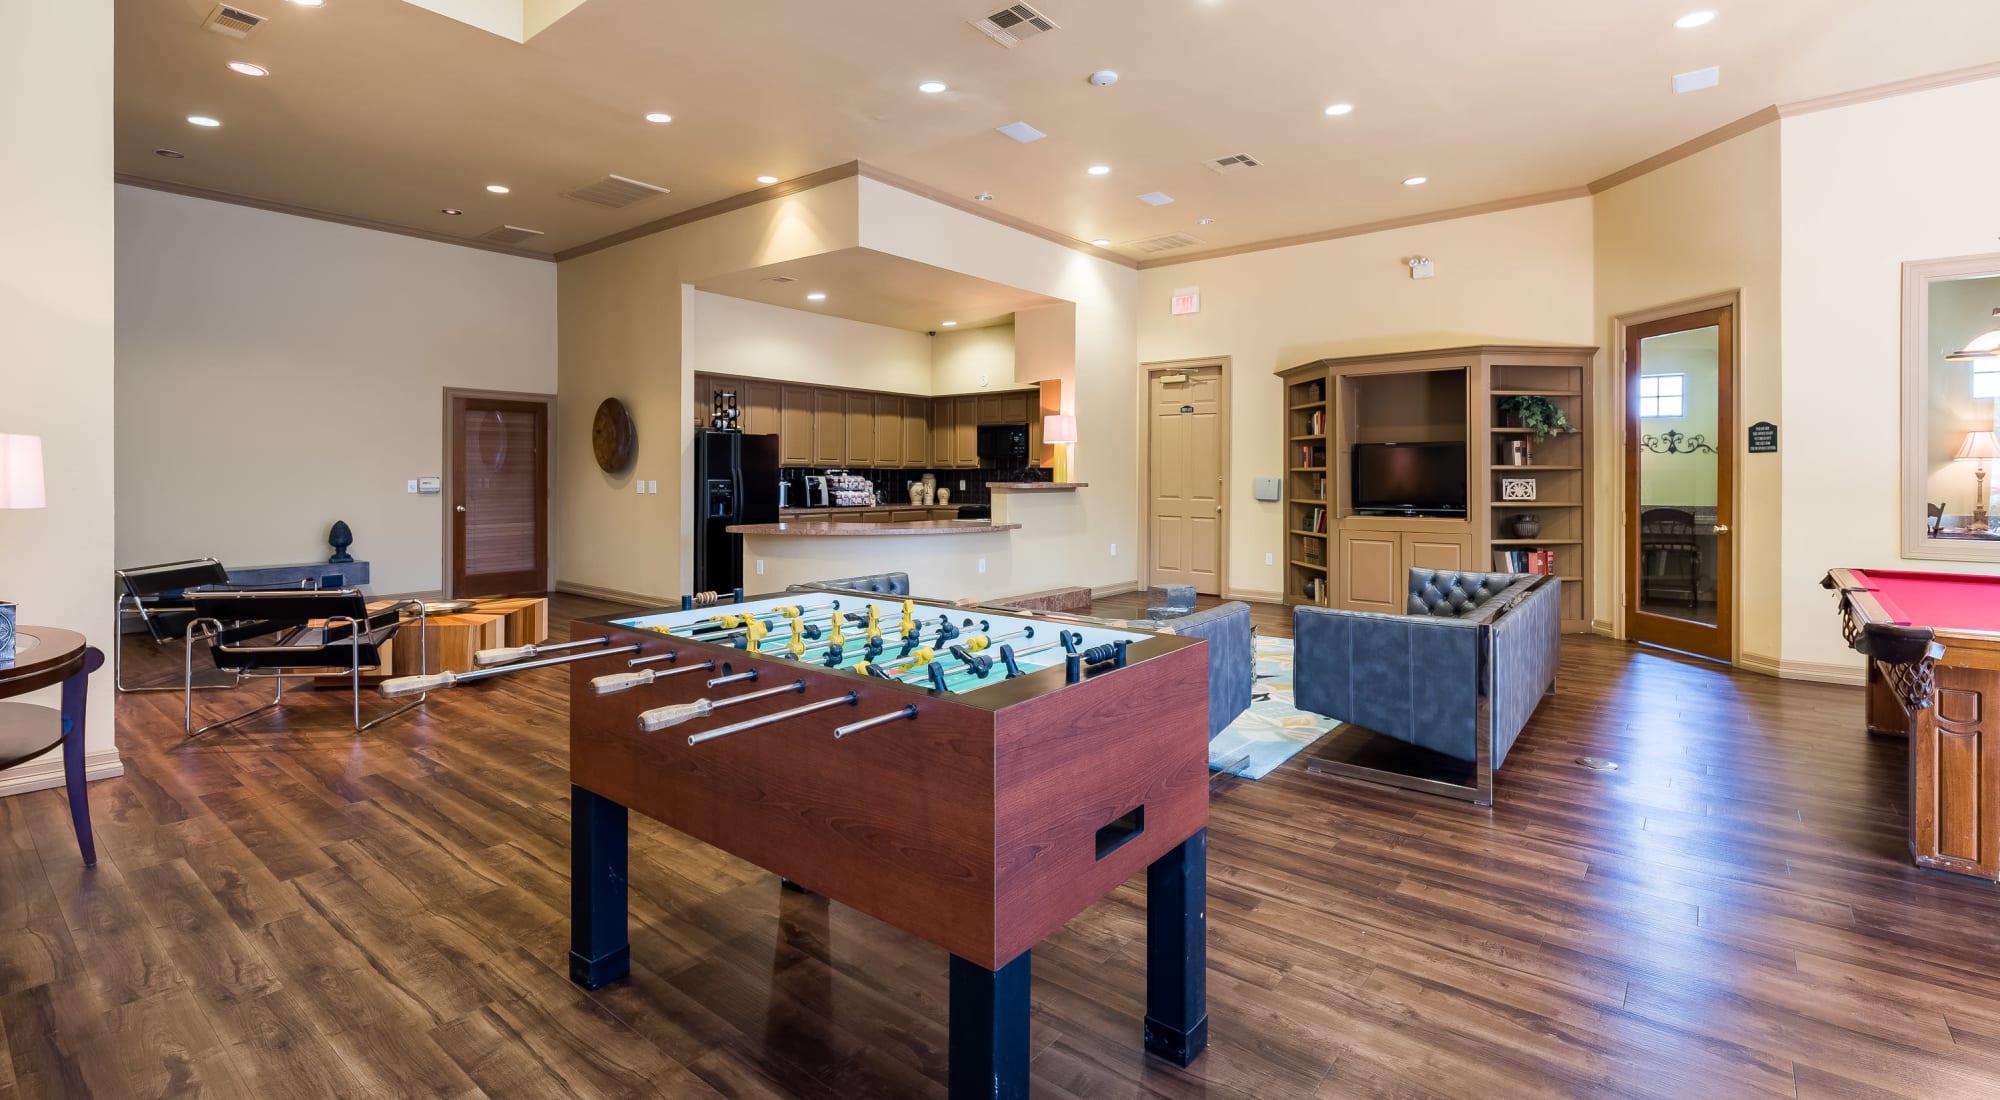 Amenities at Arbrook Park Apartment Homes in Arlington, Texas